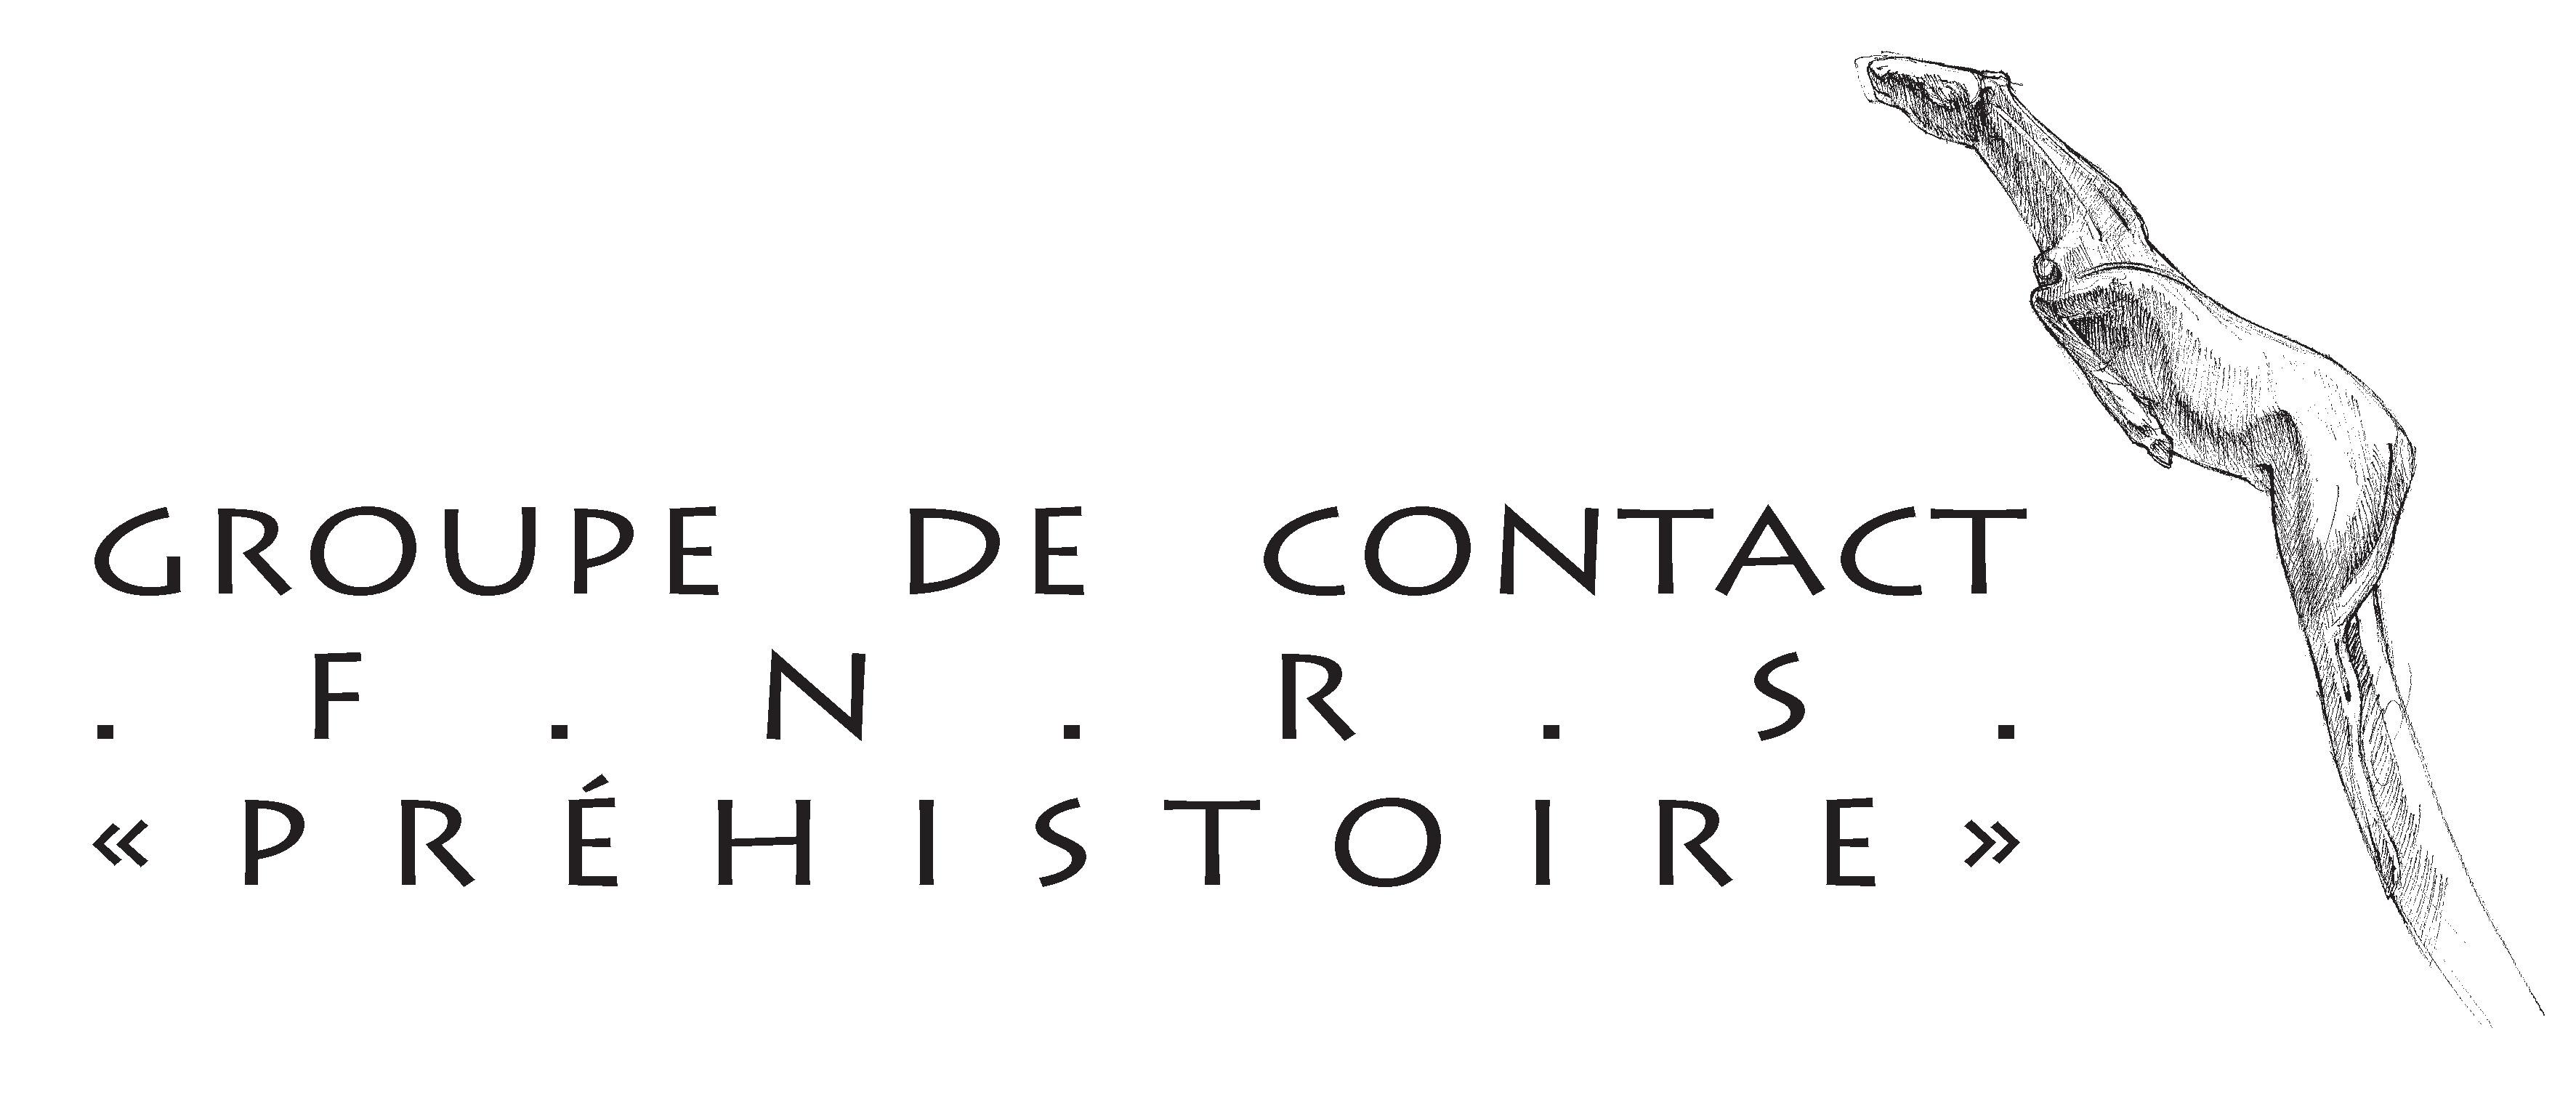 Logo_ChevalR_FNRS2011_G600_070911.jpg